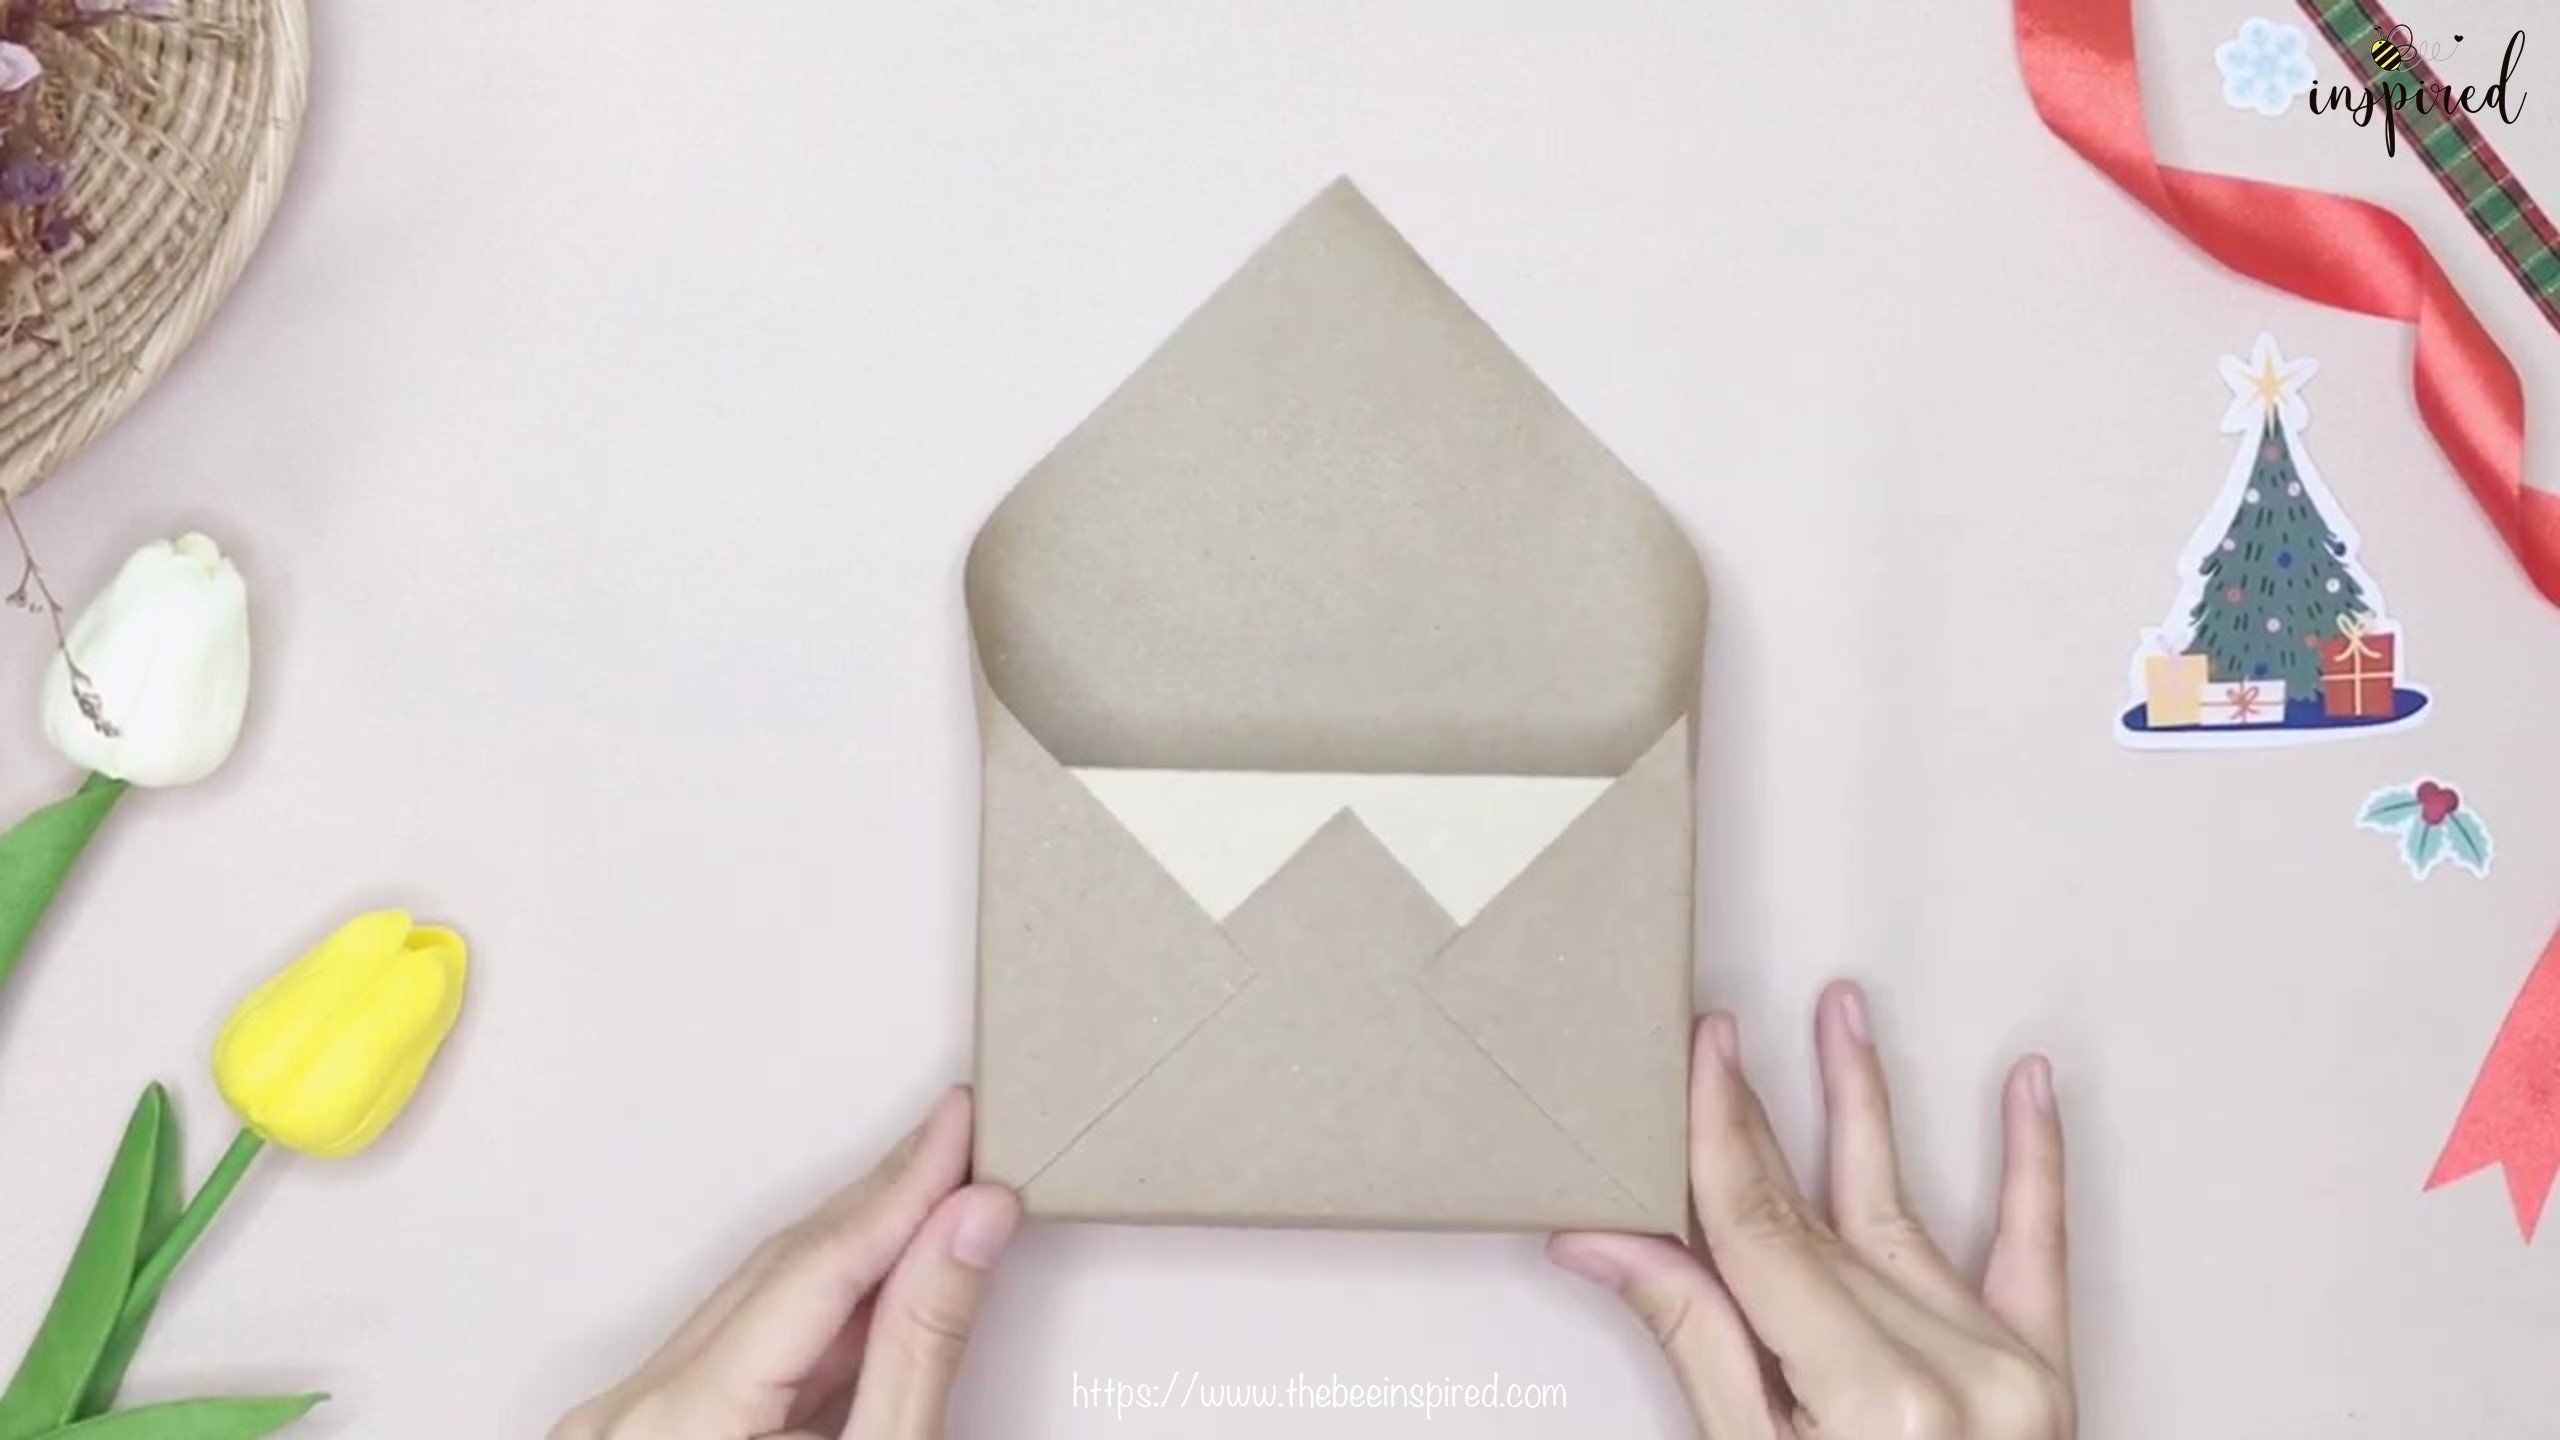 DIY วิธีห่อของขวัญวันวาเลนไทน์ วันปีใหม่ วันคริสมาส & วันเกิด แบบประหยัดกระดาษ_ Gift Wrapping Hack_10